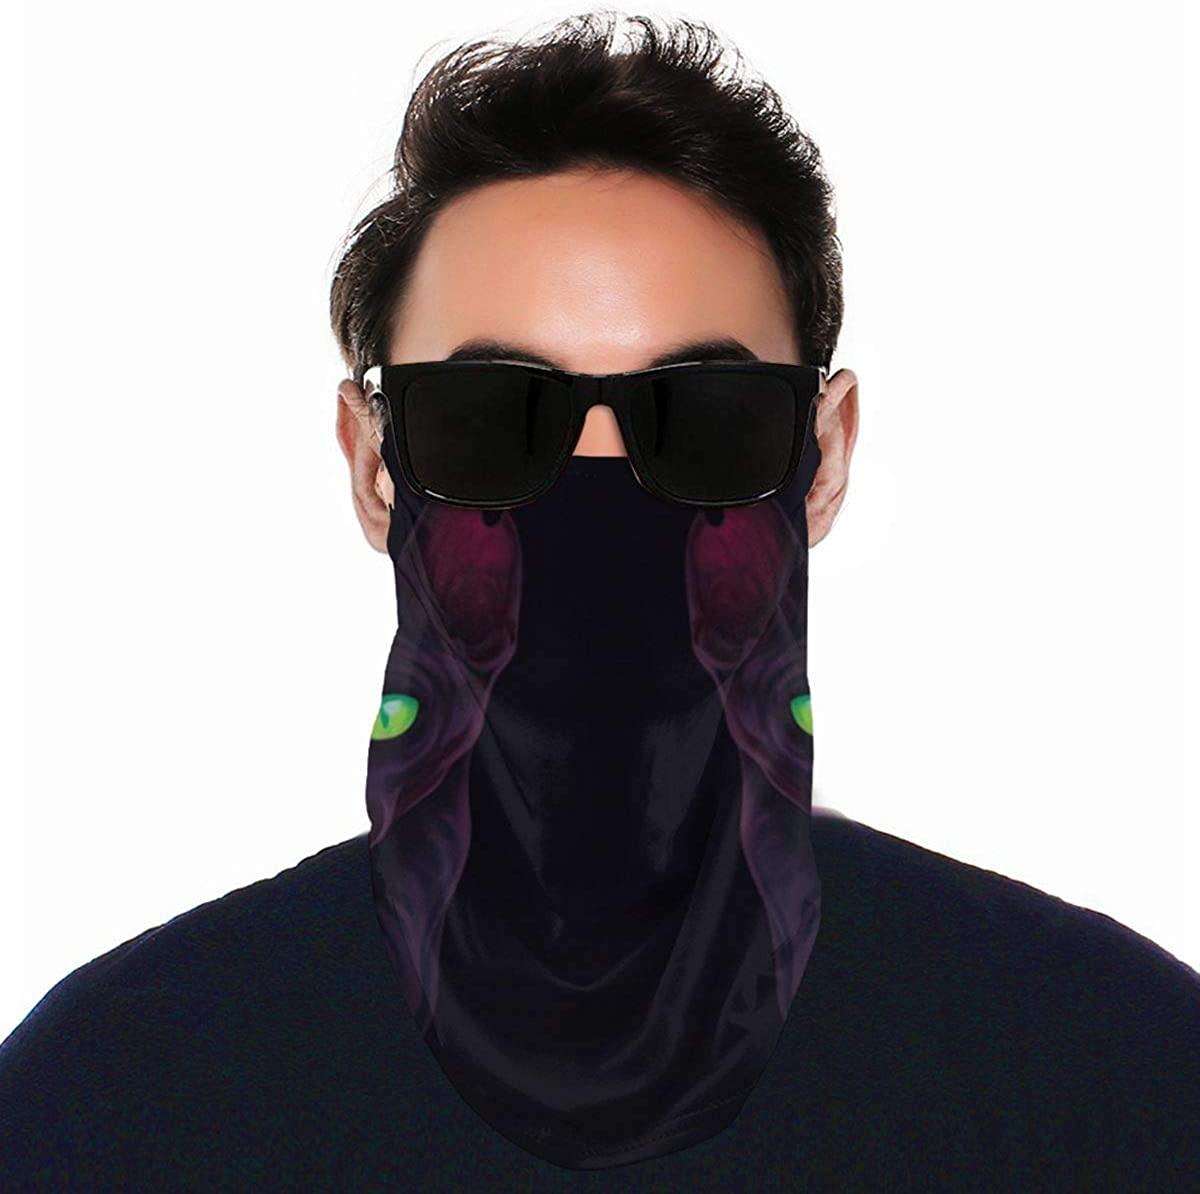 Youth Face Bandanas, Banana Reusable Face Mask Half Face Towel Mouth Cloth Facial Scarf Variety Headscarf